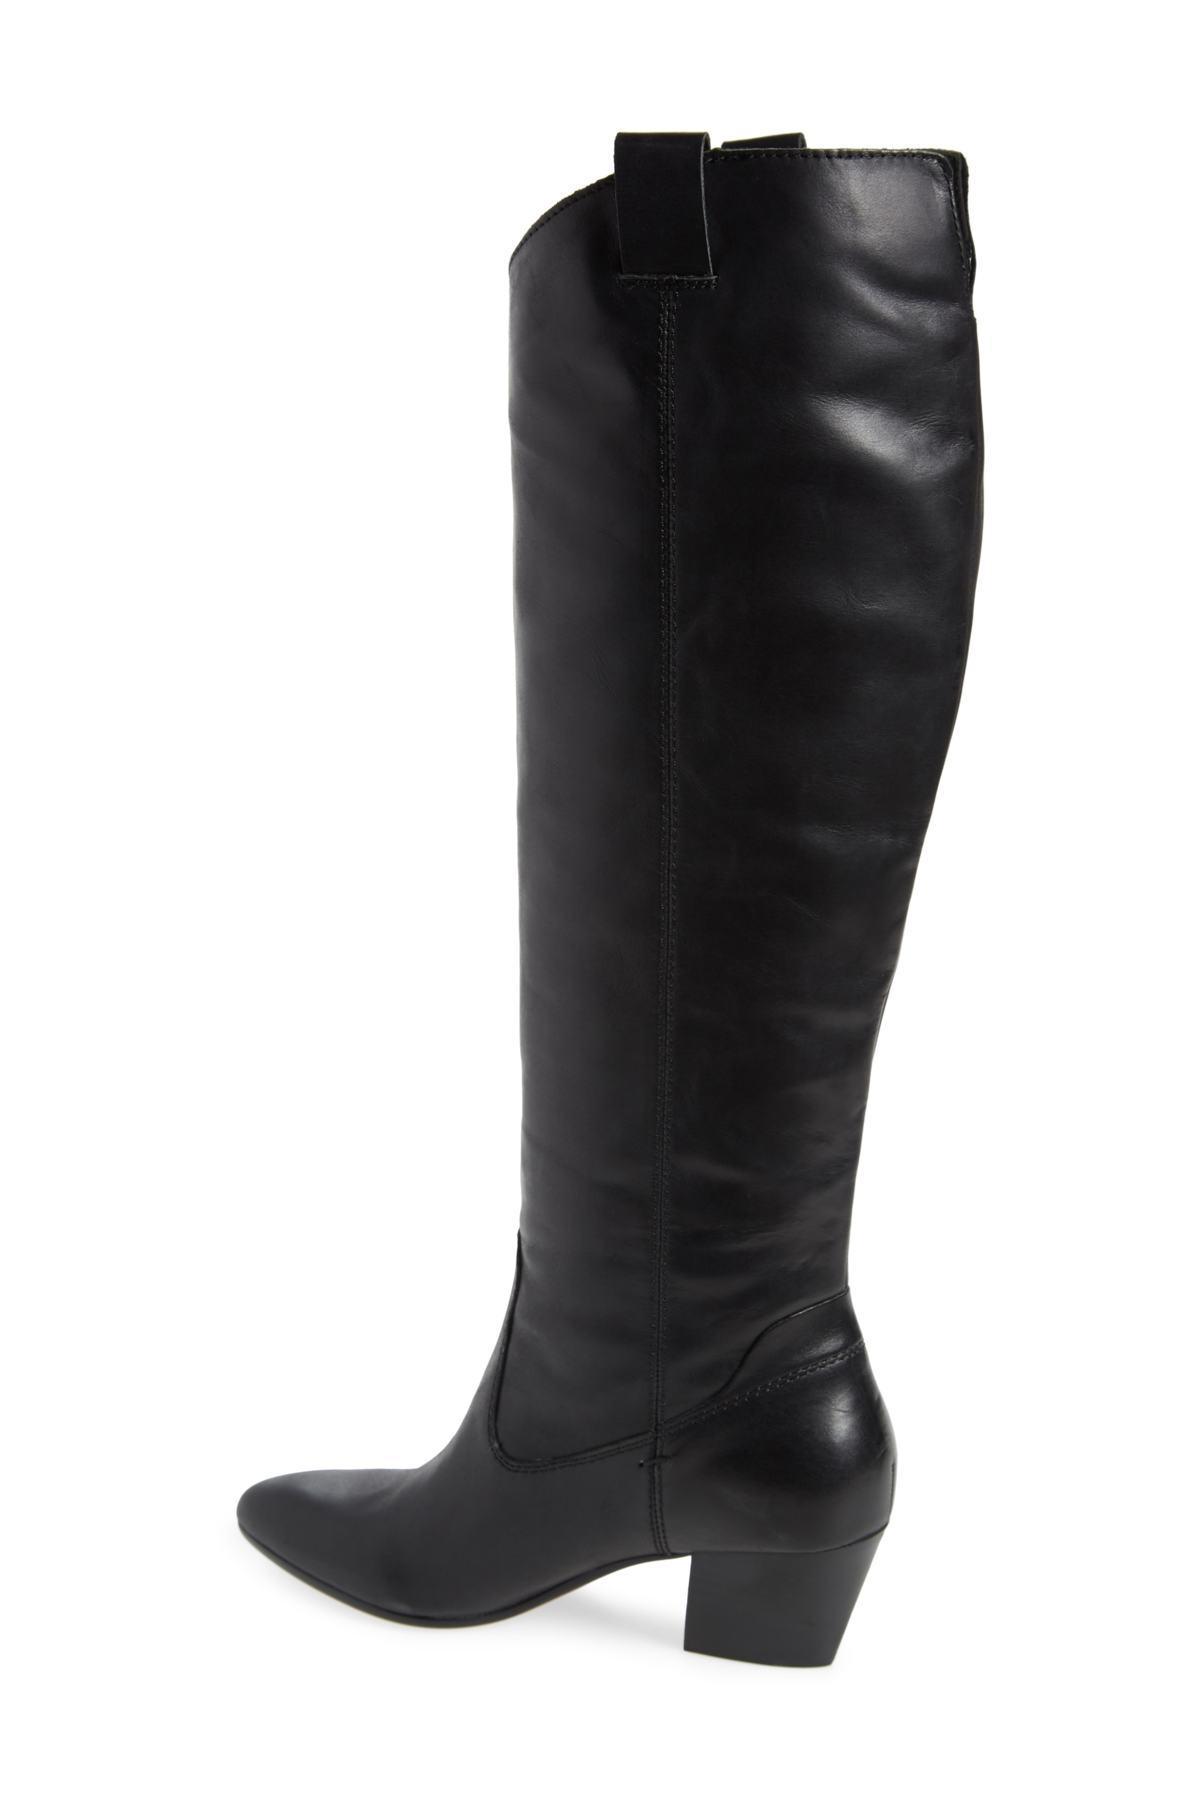 a79feed16eb Dolce Vita - Black Hinley Knee High Boot (women) - Lyst. View fullscreen